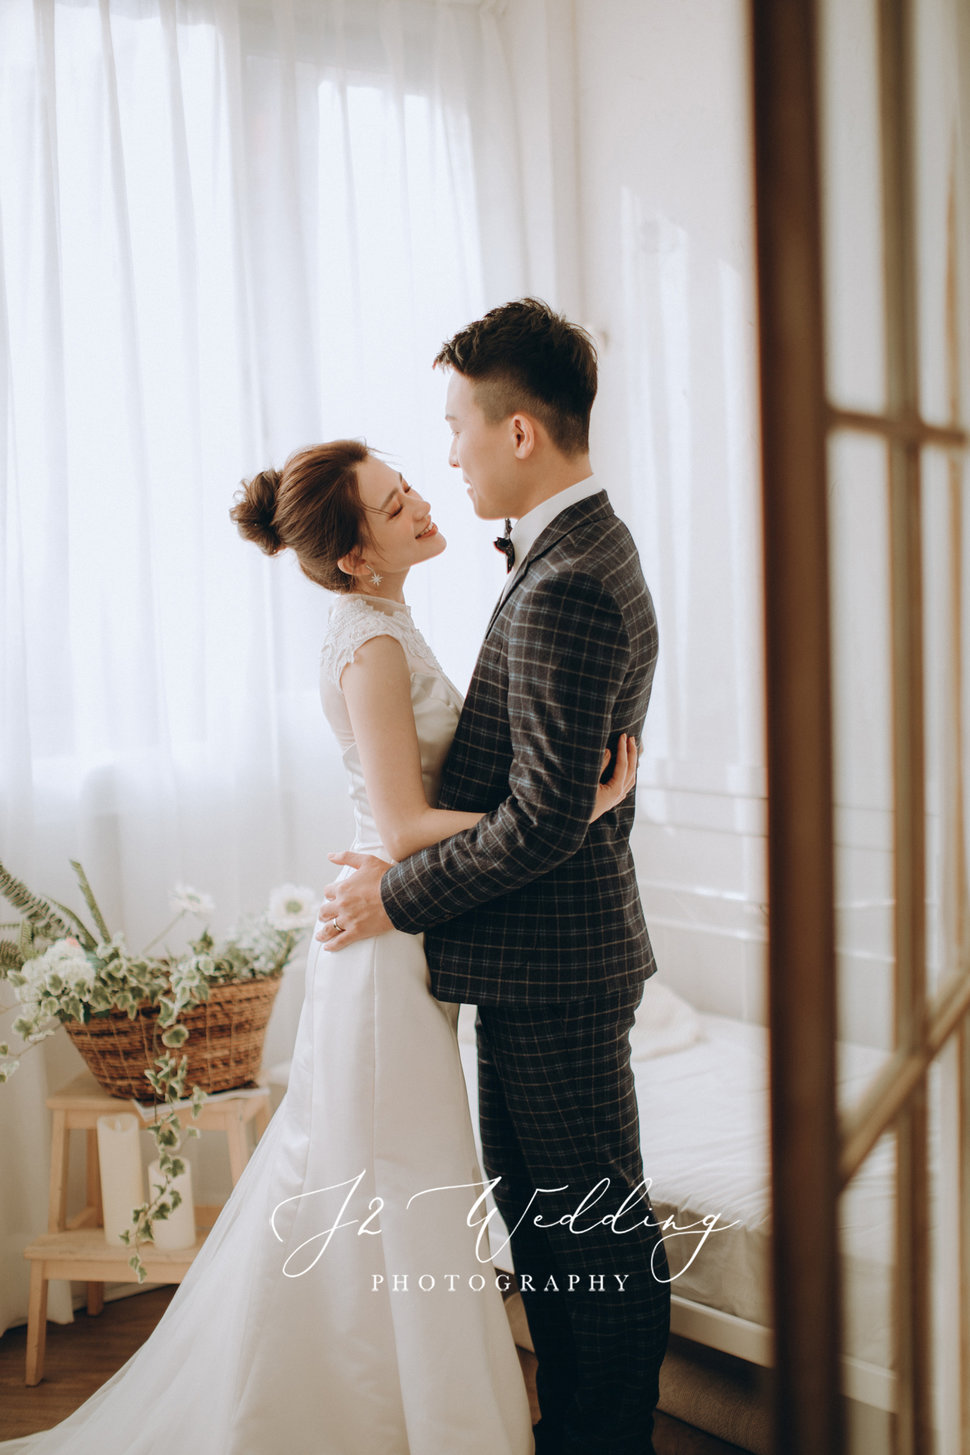 069A00182 - J2 wedding 中壢《結婚吧》